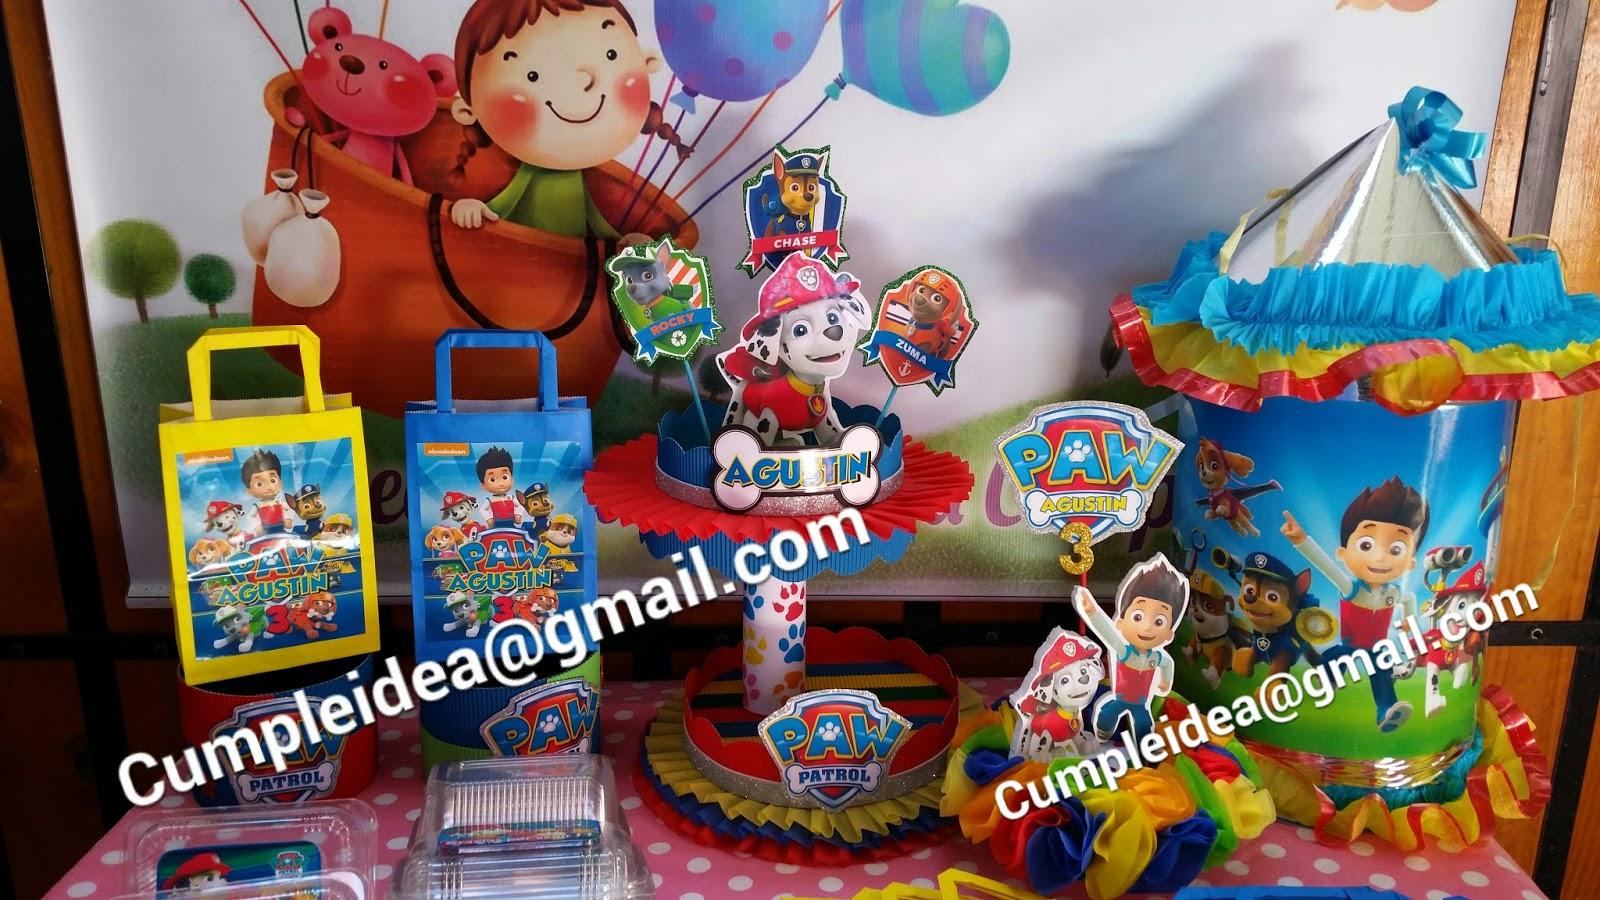 Decoraciones infantiles abril 2015 for Decoraciones infantiles